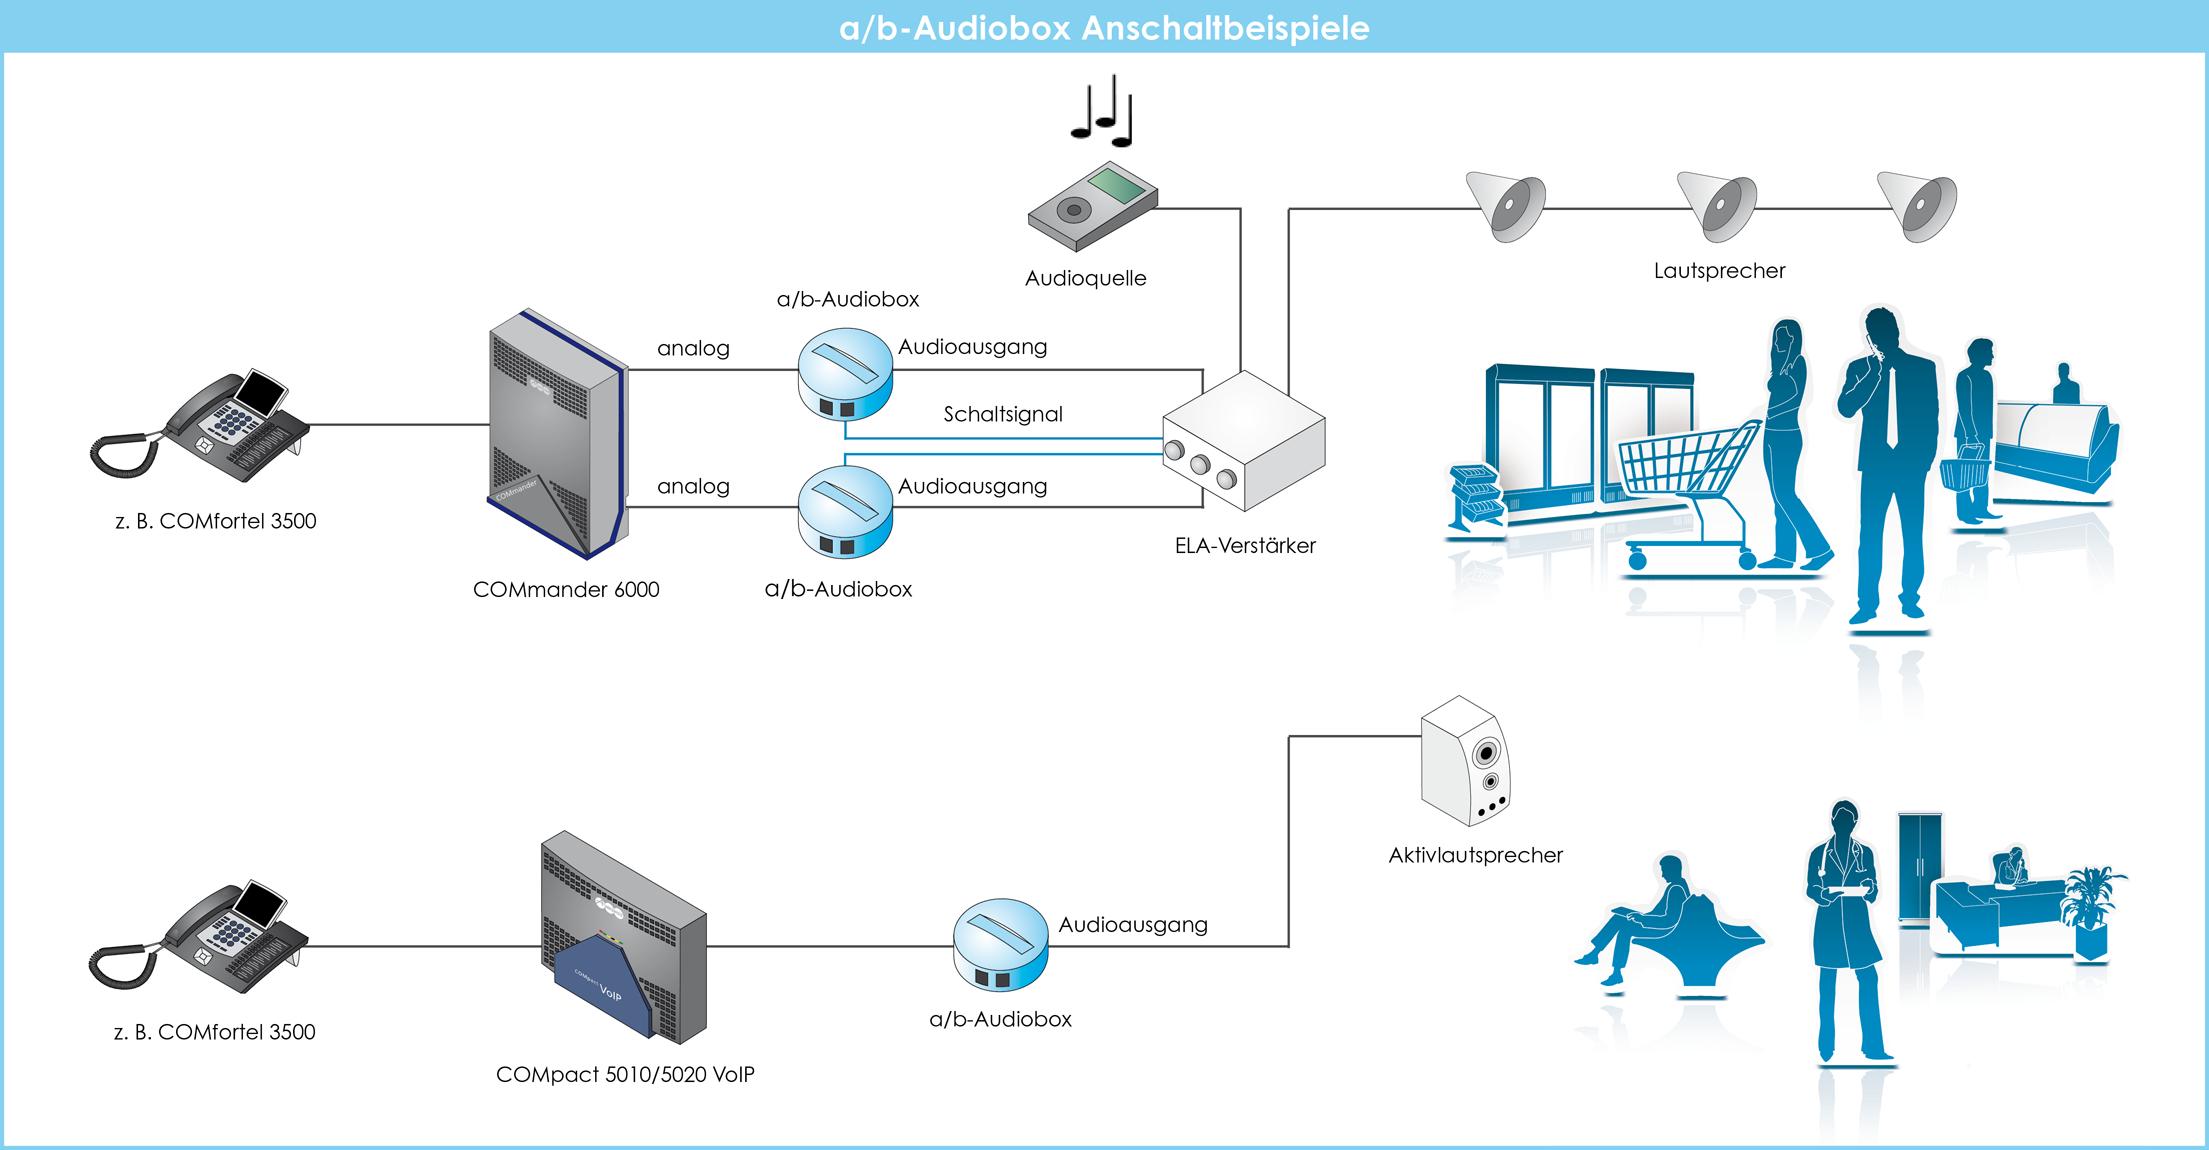 ISDN Telefon mit Intercom Funktion - COMpact 5010/5020 VoIP ...